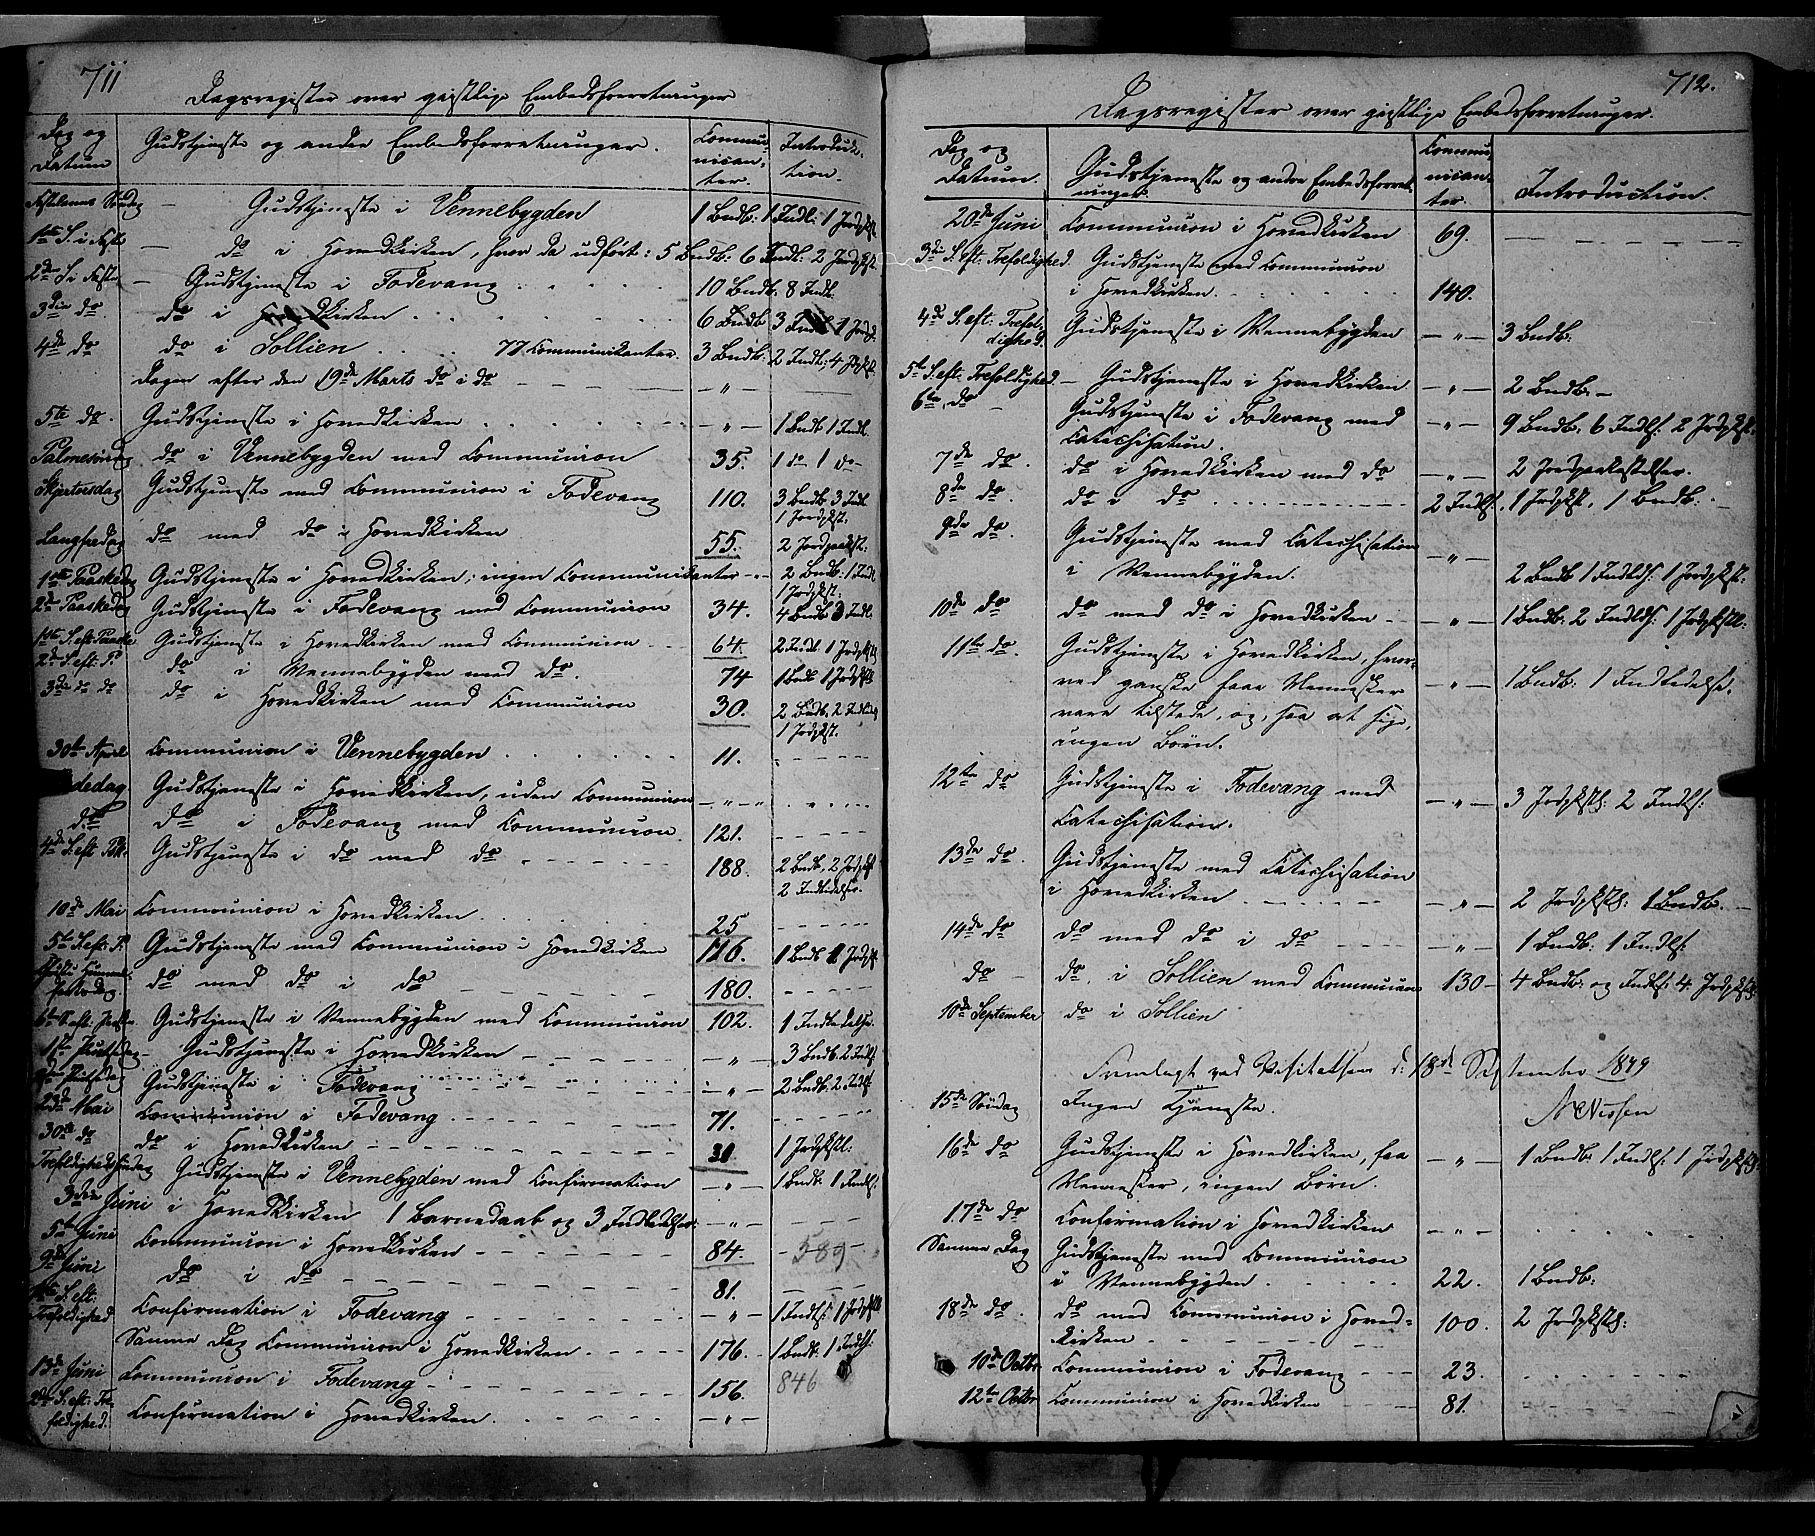 SAH, Ringebu prestekontor, Ministerialbok nr. 6, 1848-1859, s. 711-712